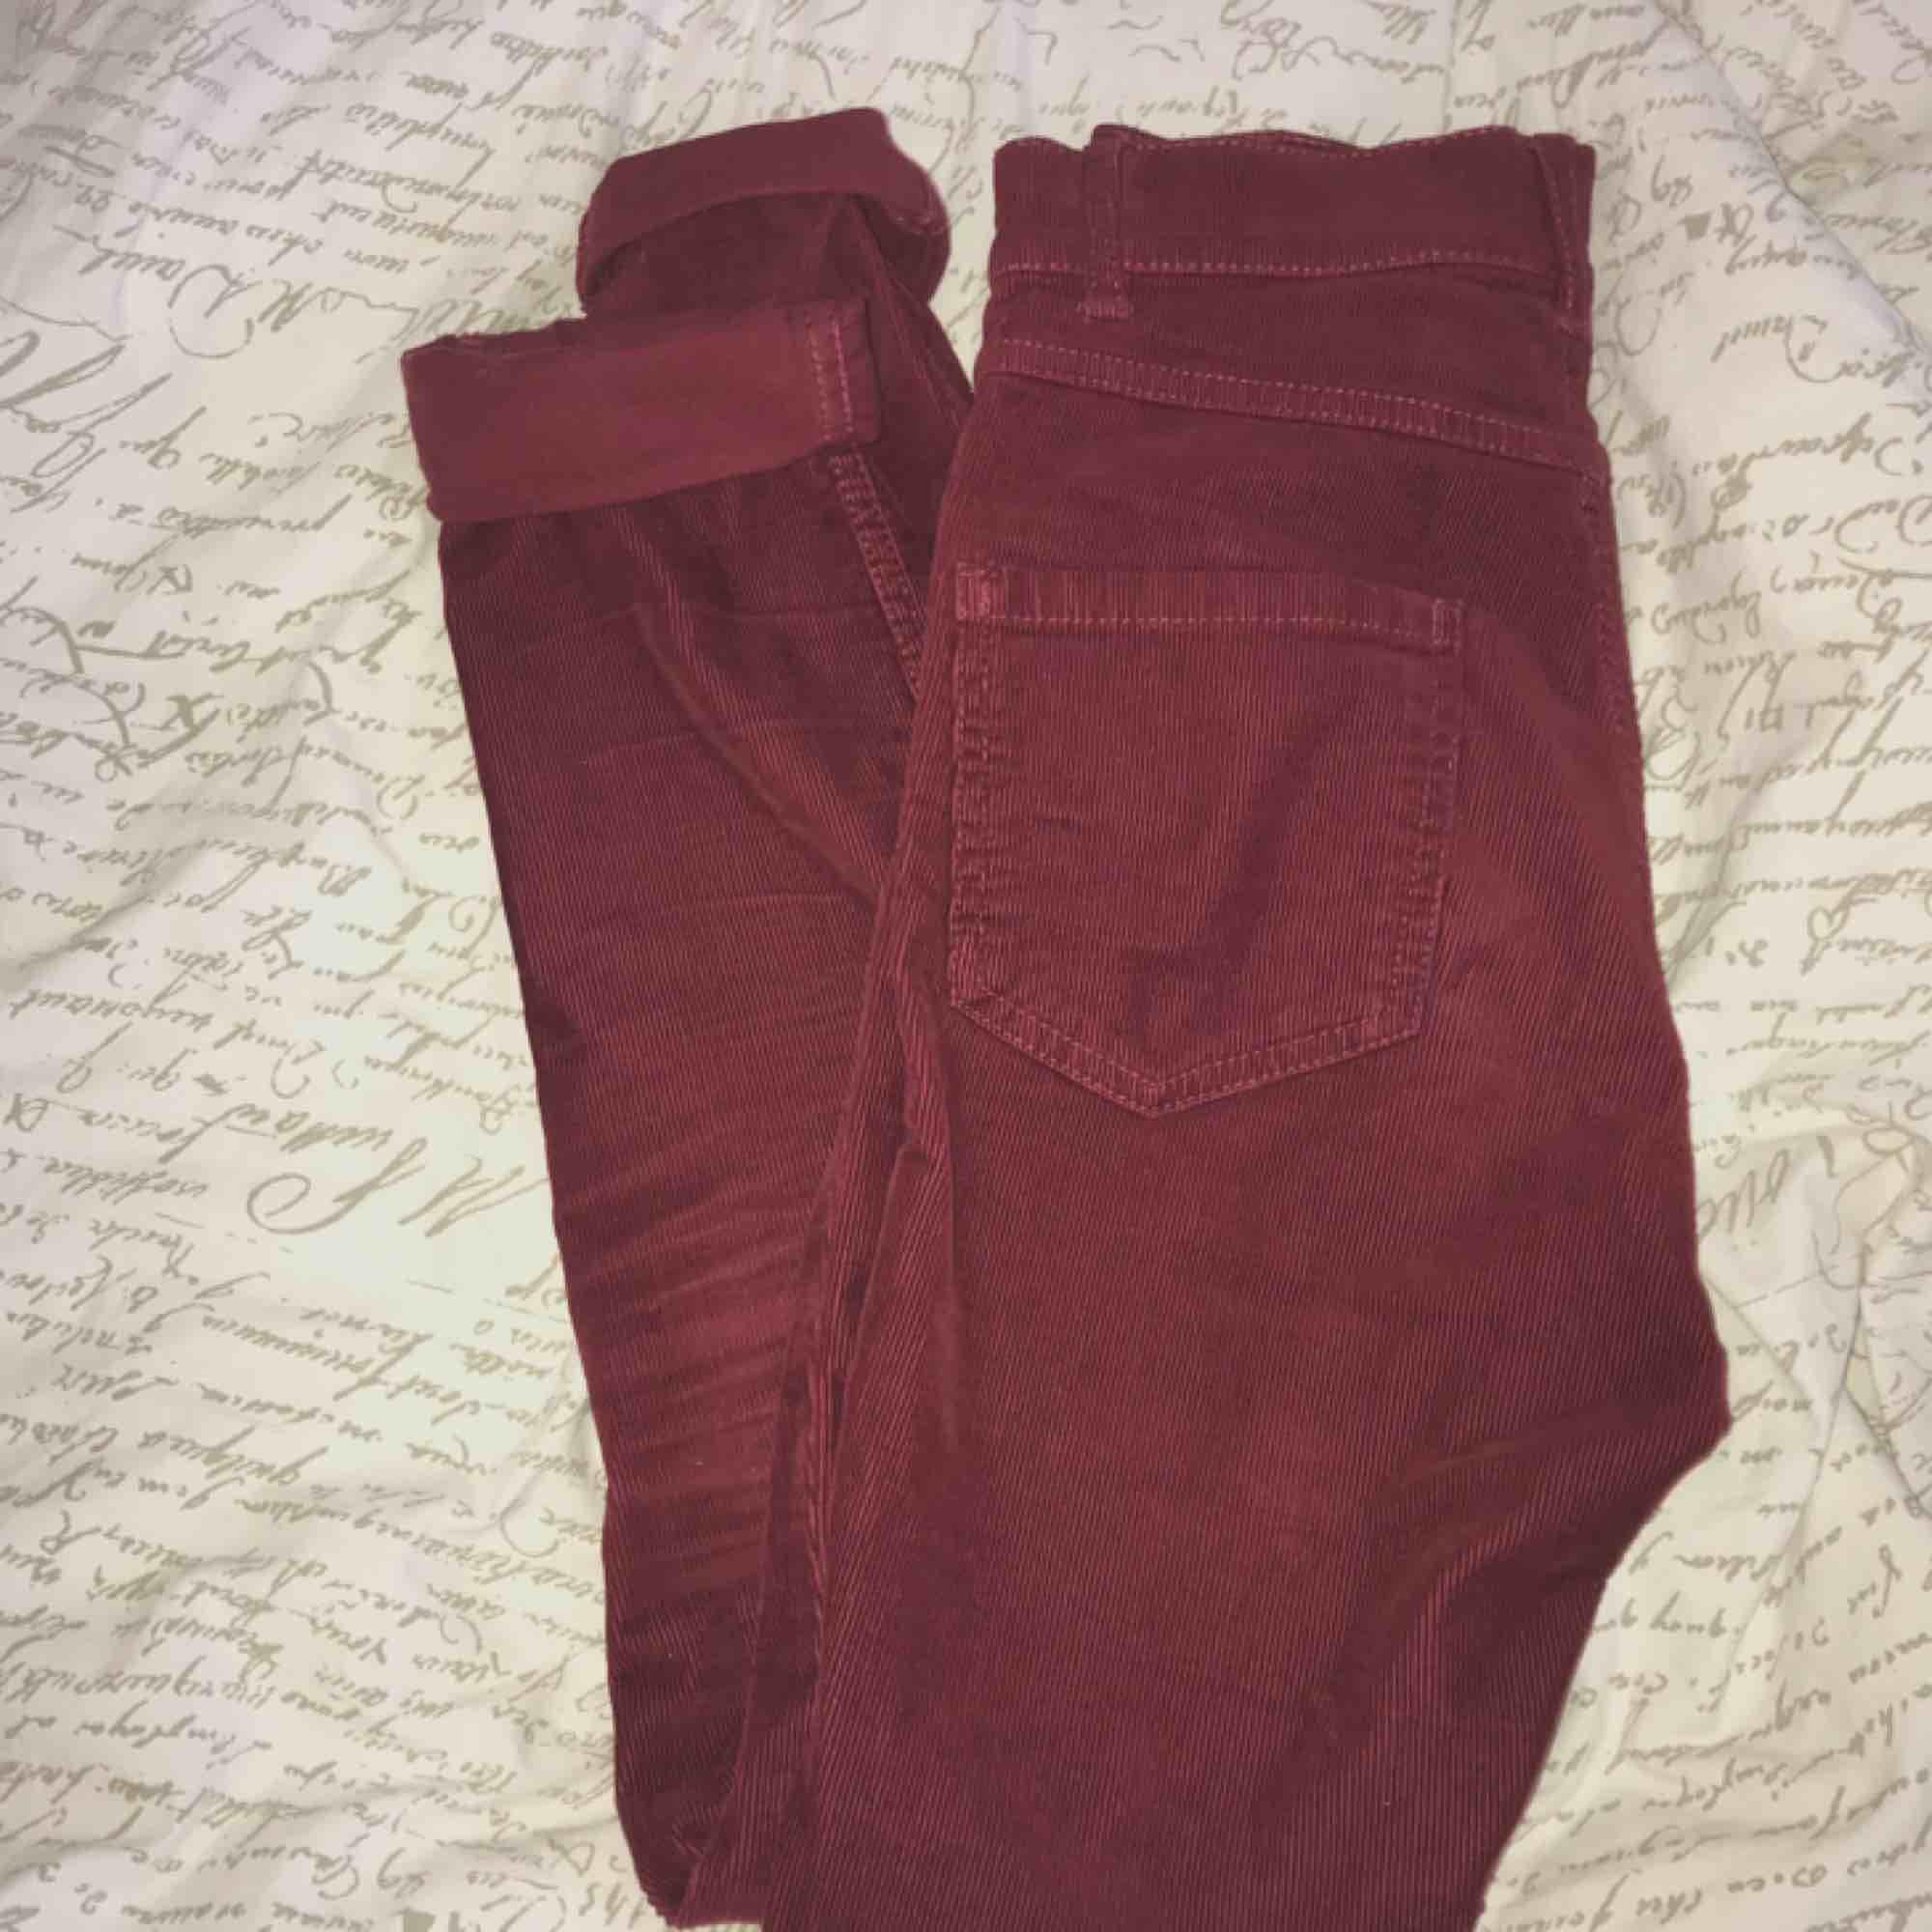 Högmidjade vinröda Monki jeans storlek xs/s Stretchiga och sköna! Nyskick💕. Jeans & Byxor.